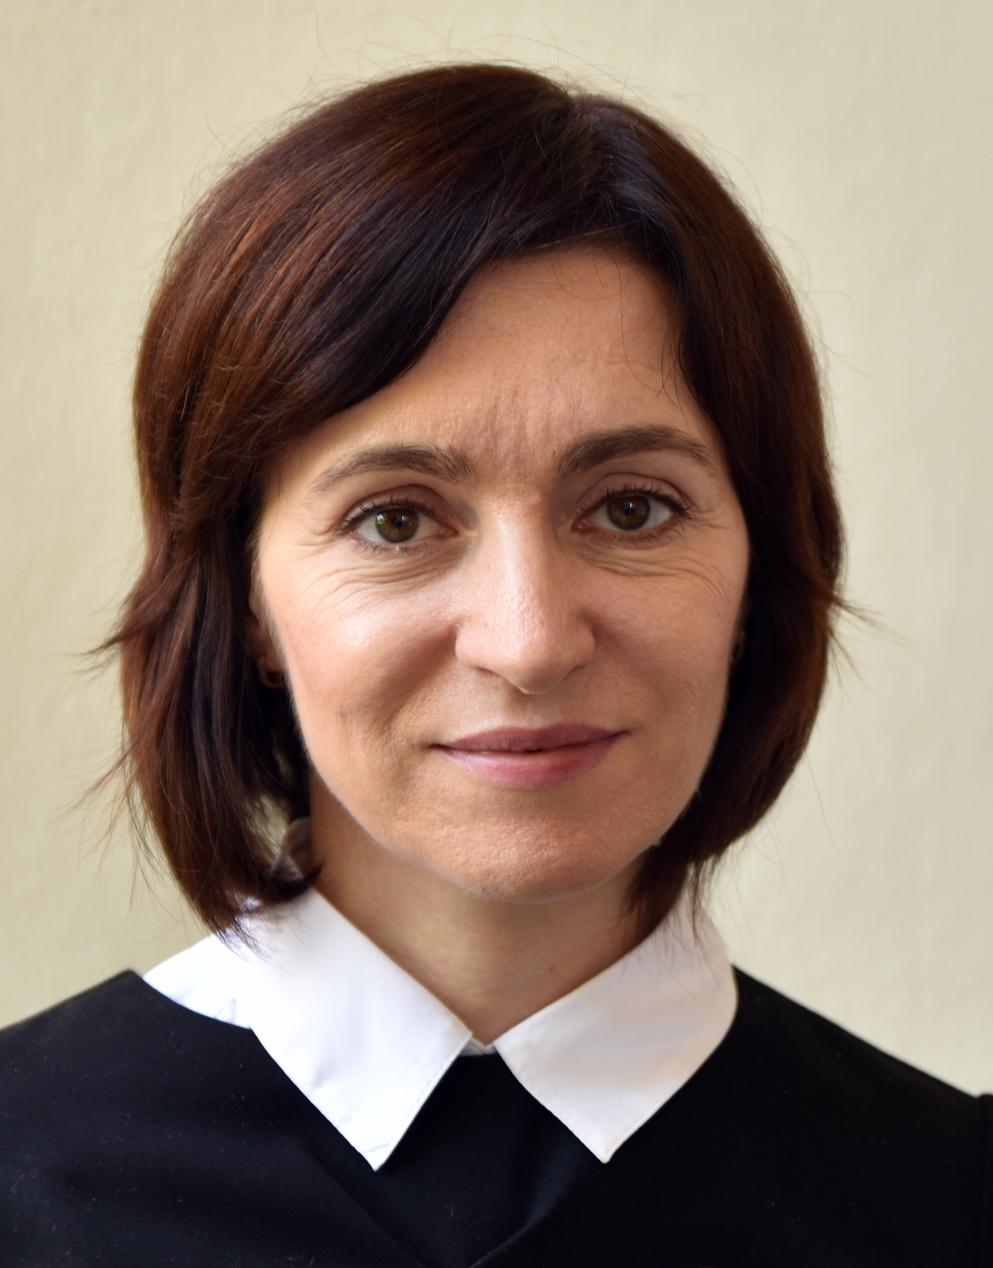 Maia Sandu est élue présidente de la Moldavie • PopulationData.net